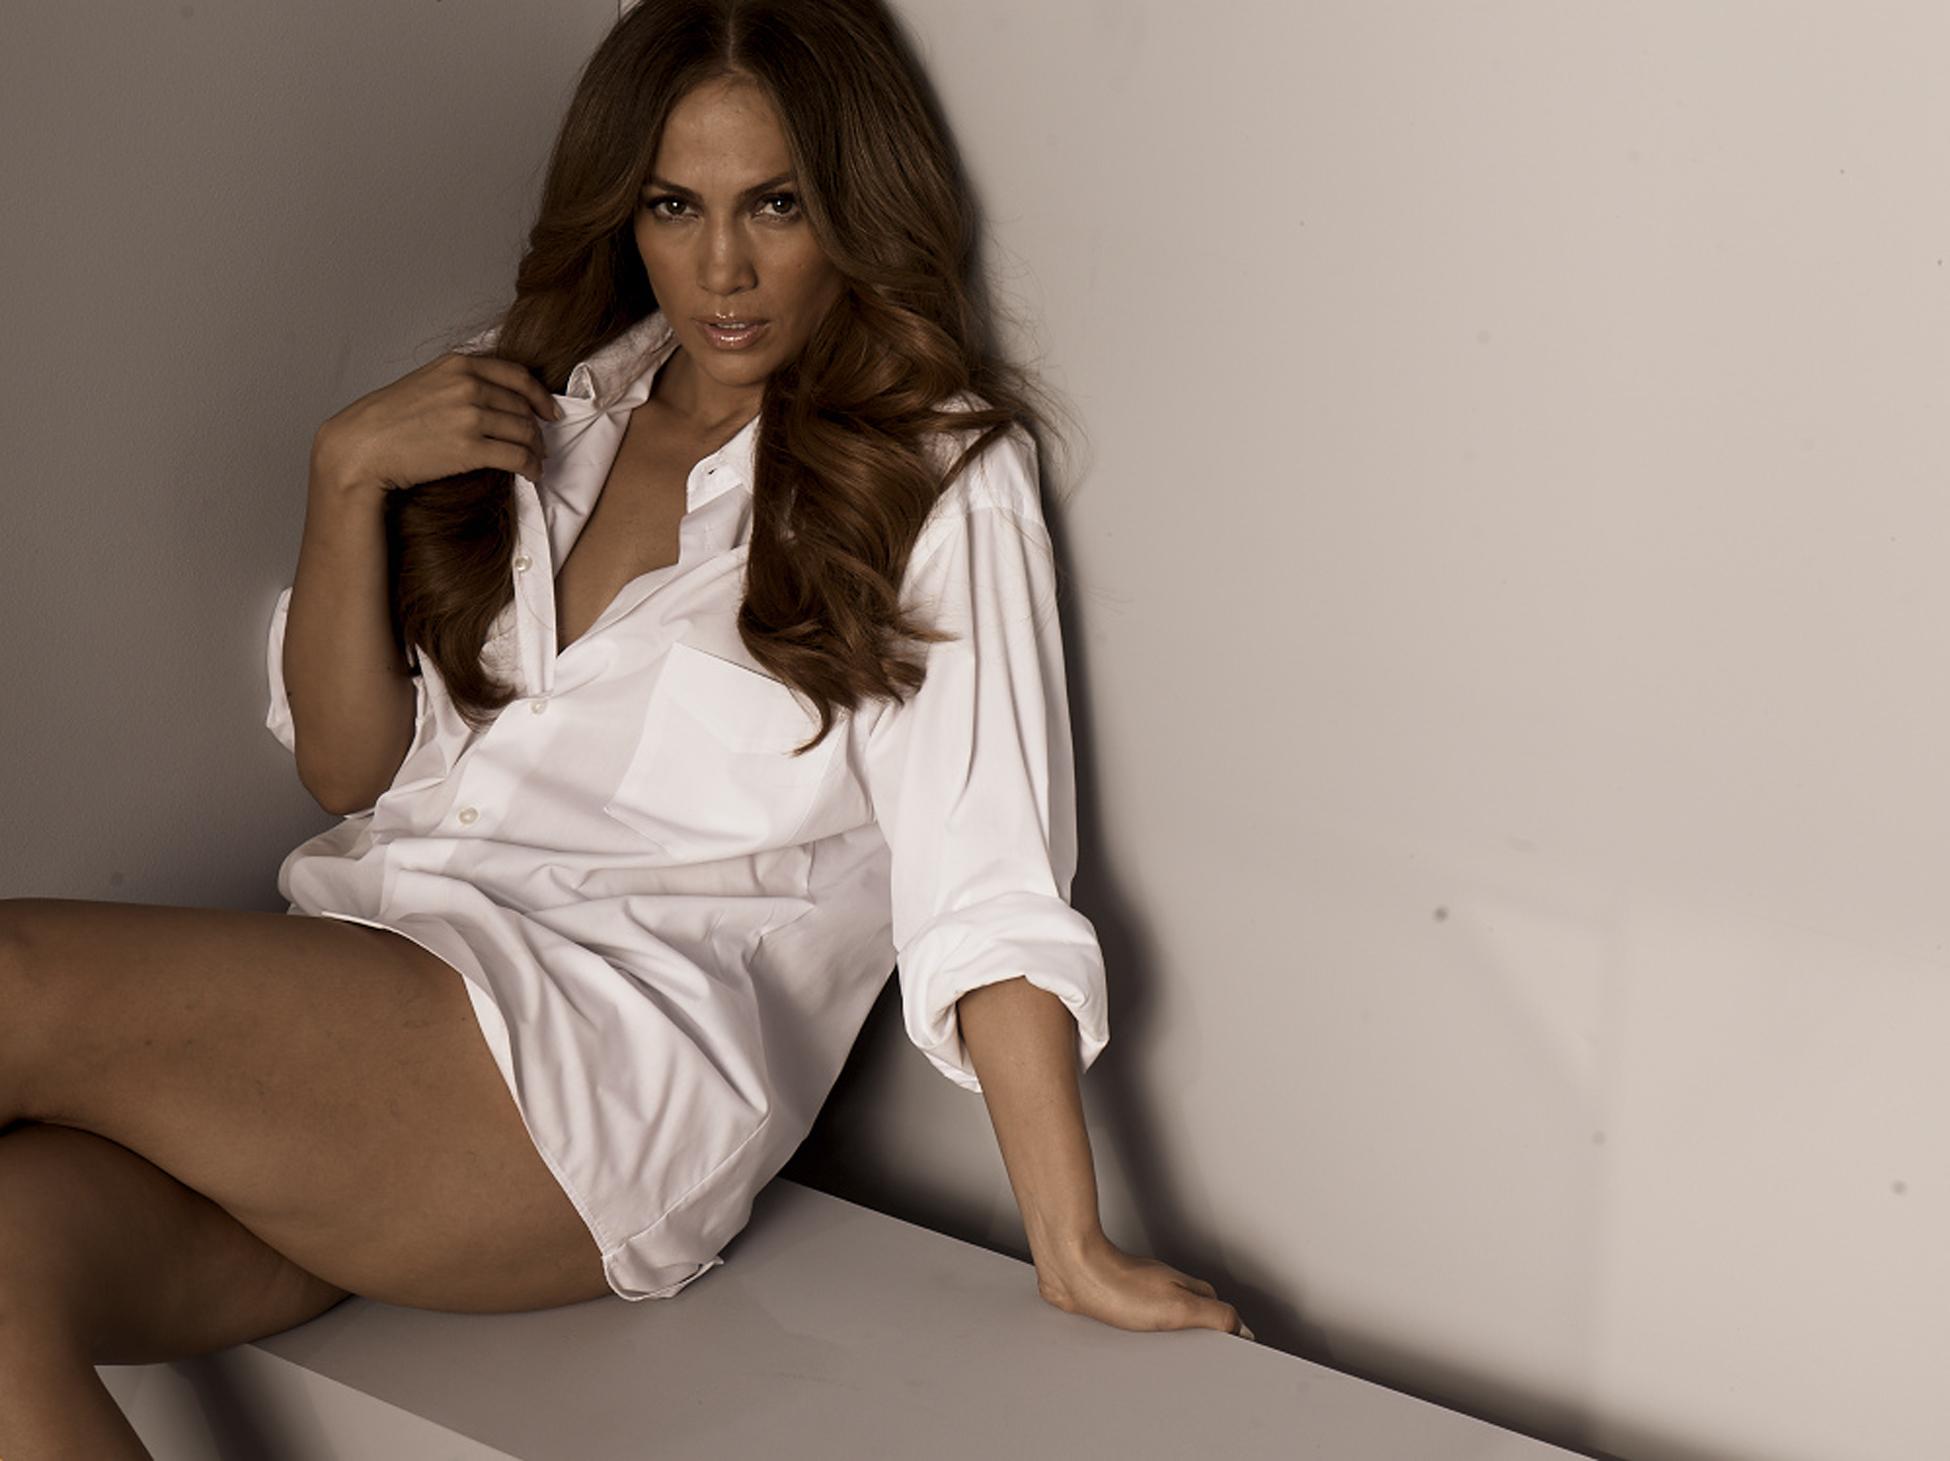 Jennifer Lopez in Bikini, June 20, 2019 - 2019 year